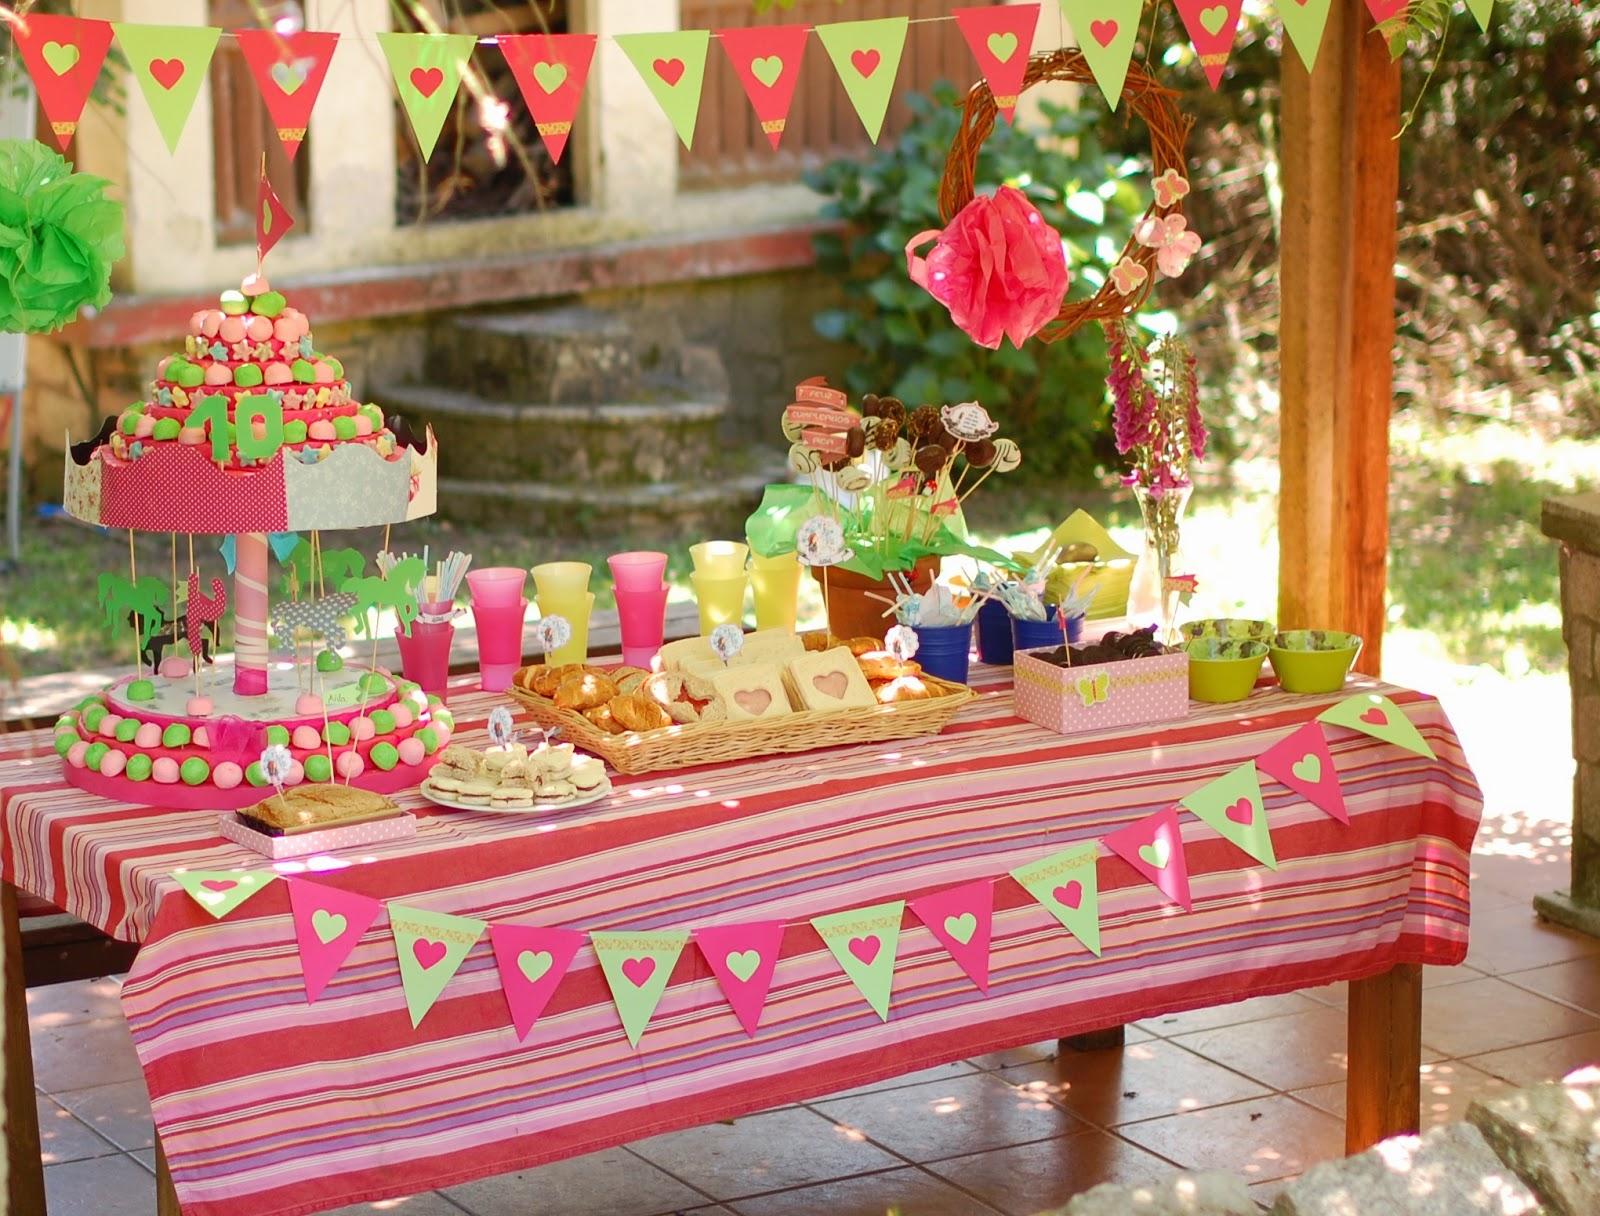 http://sosunnyblog.blogspot.com.es/2014/04/cumpleanos-verde-y-rosa-ganas-de.html